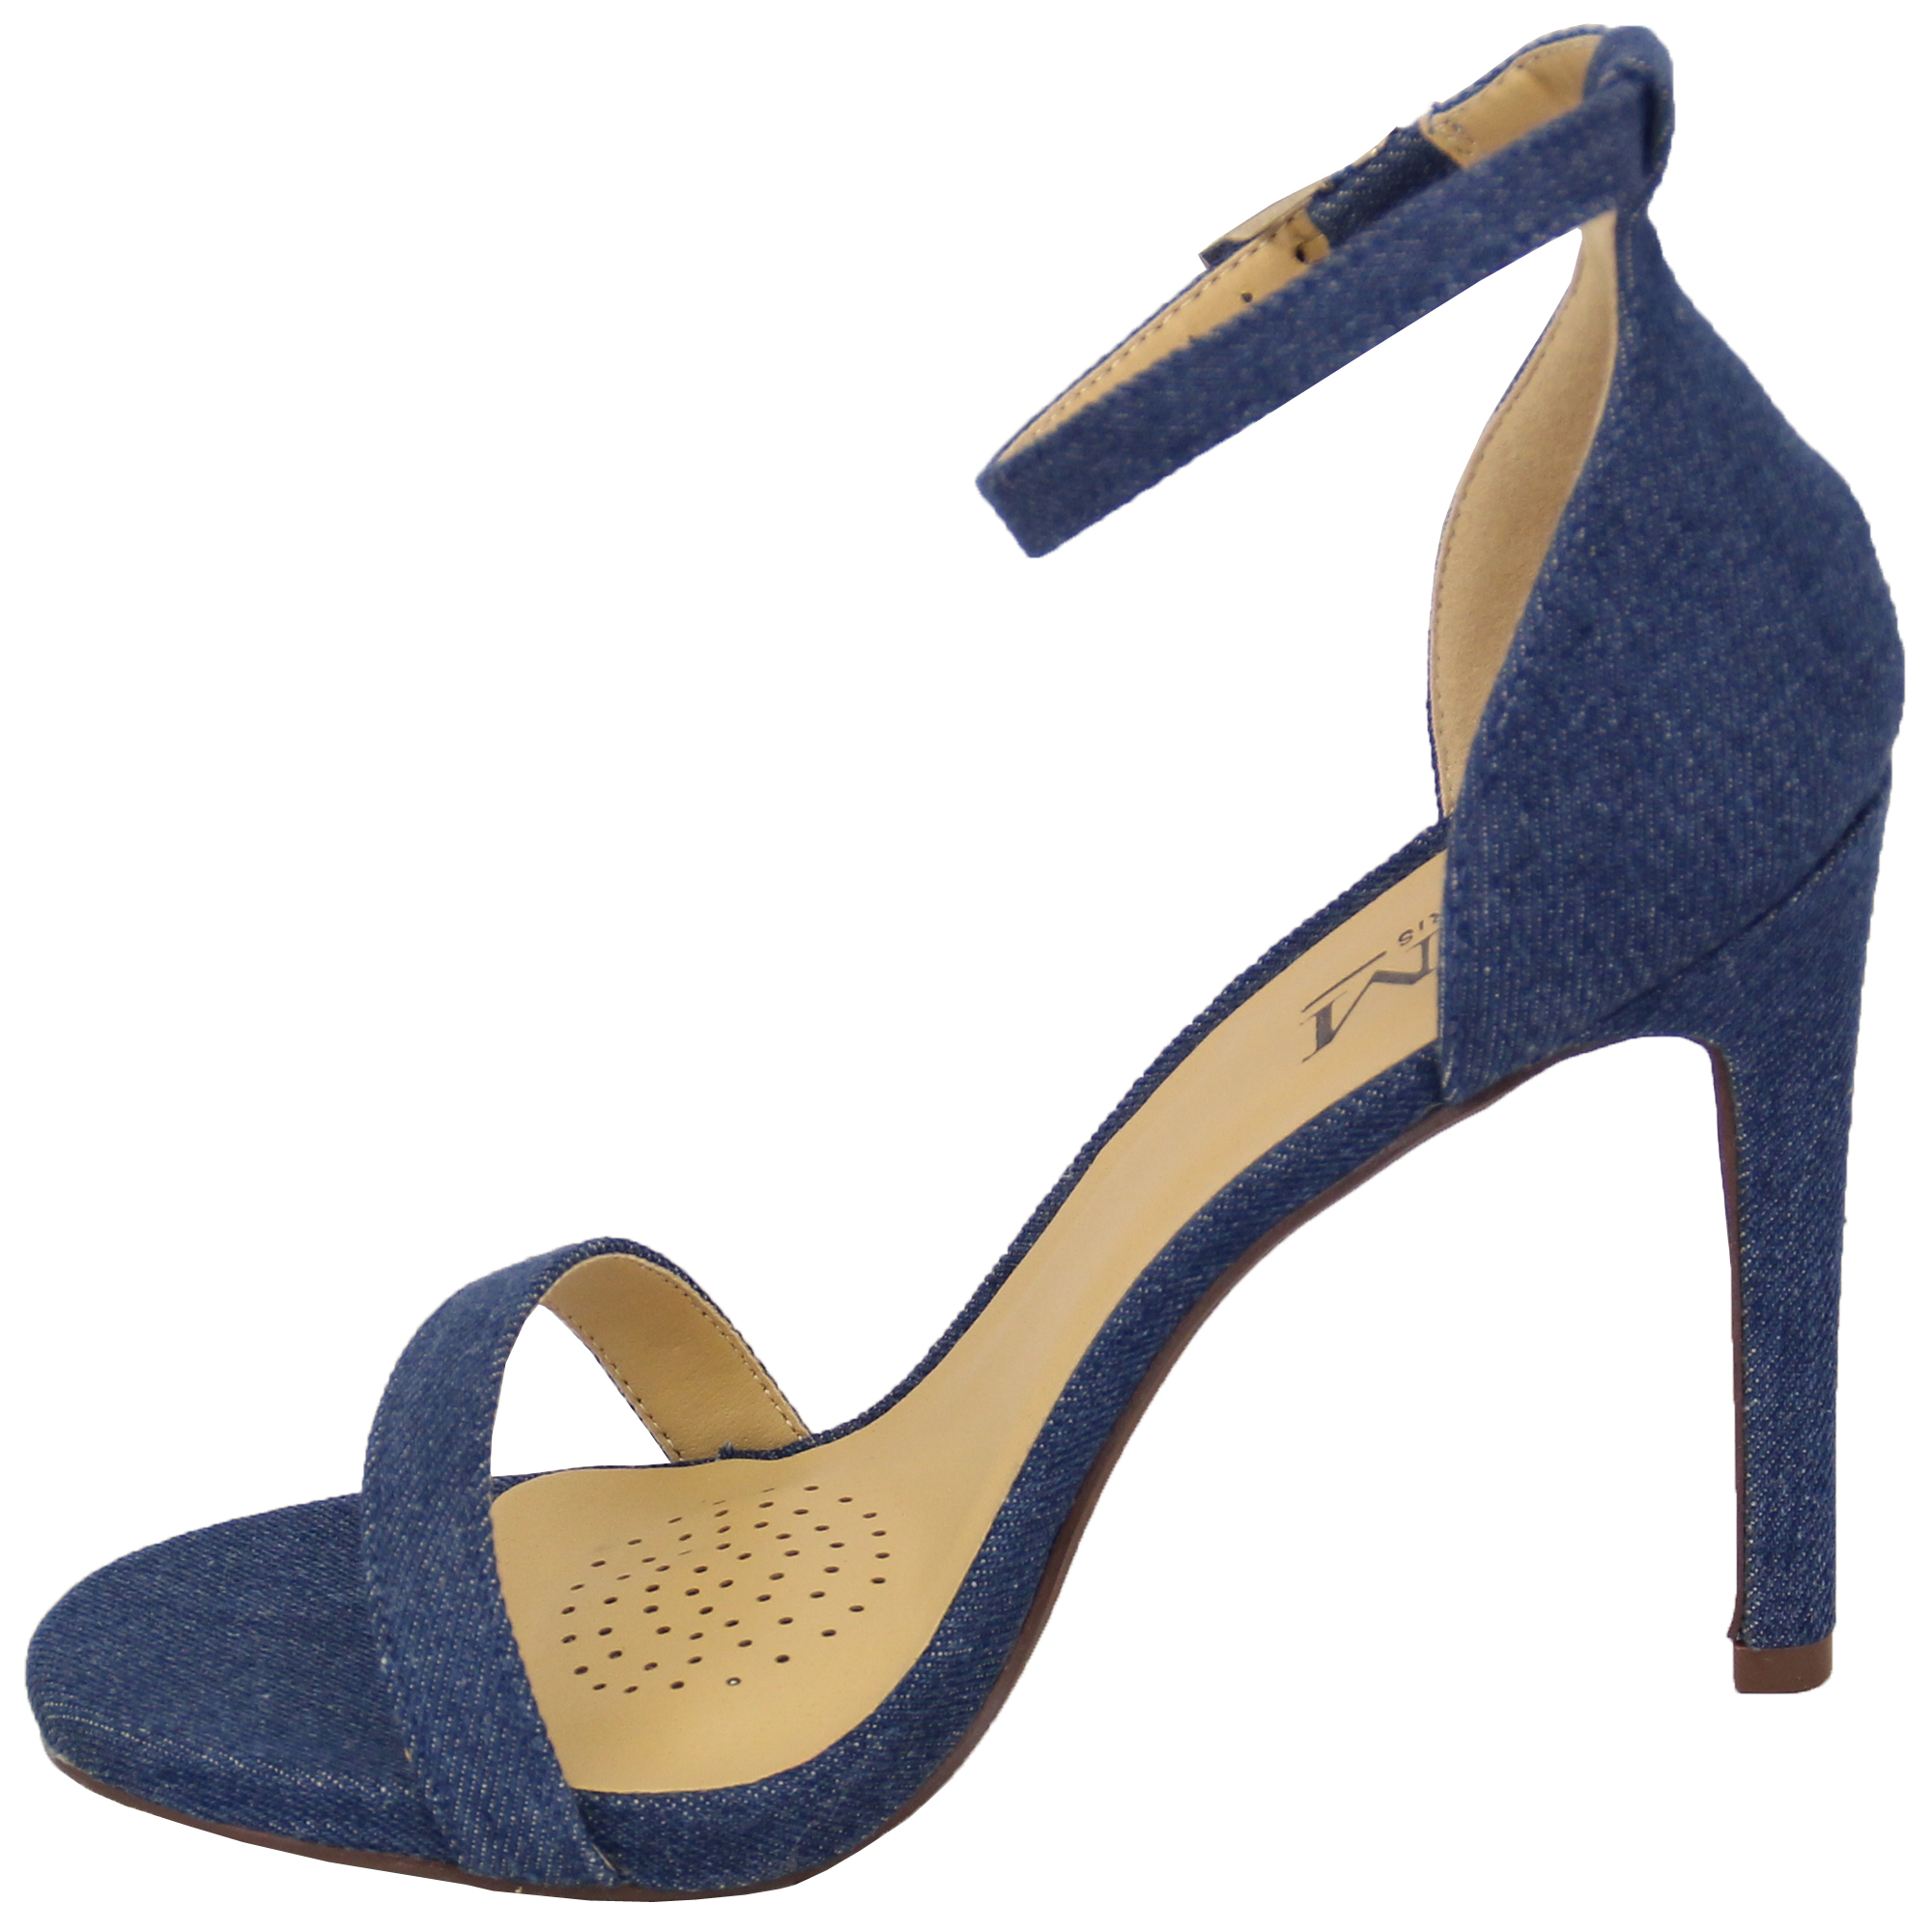 dd3fe1ce6 Ladies Denim Sandals Womens Ankle Strap Stiletto Heel Buckle Open ...